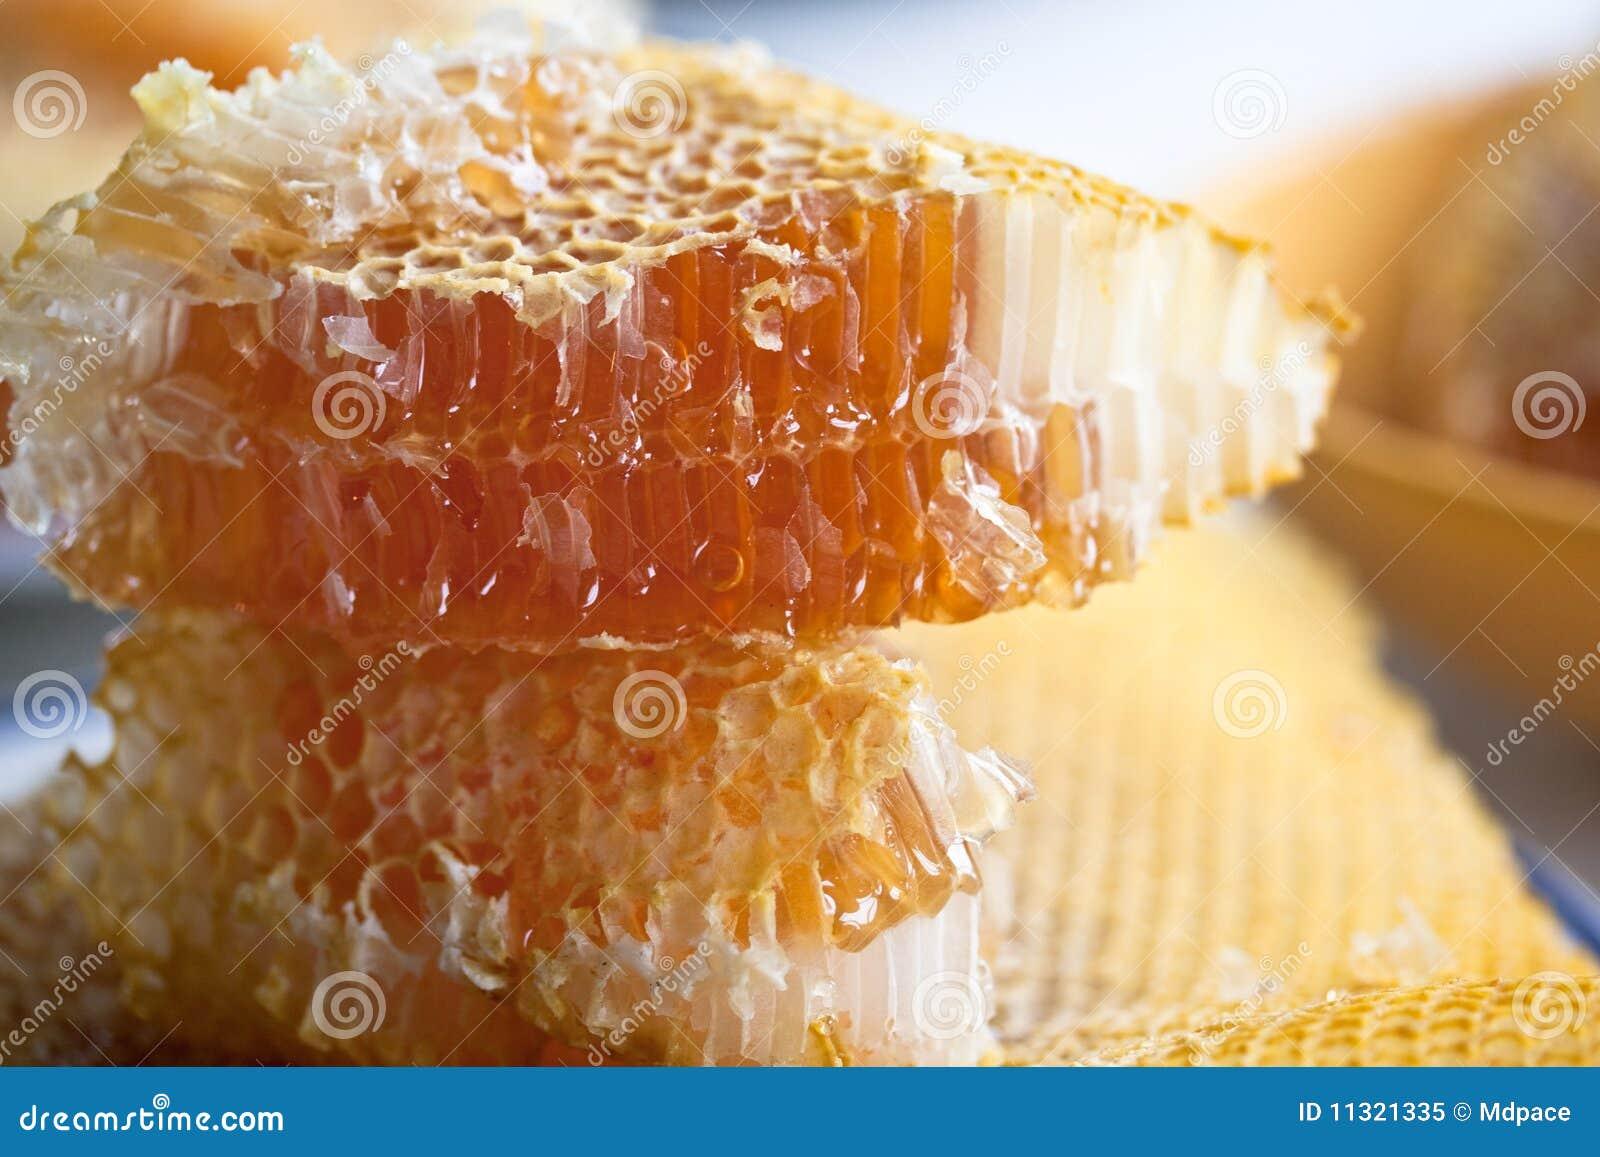 Stapel des Honigs